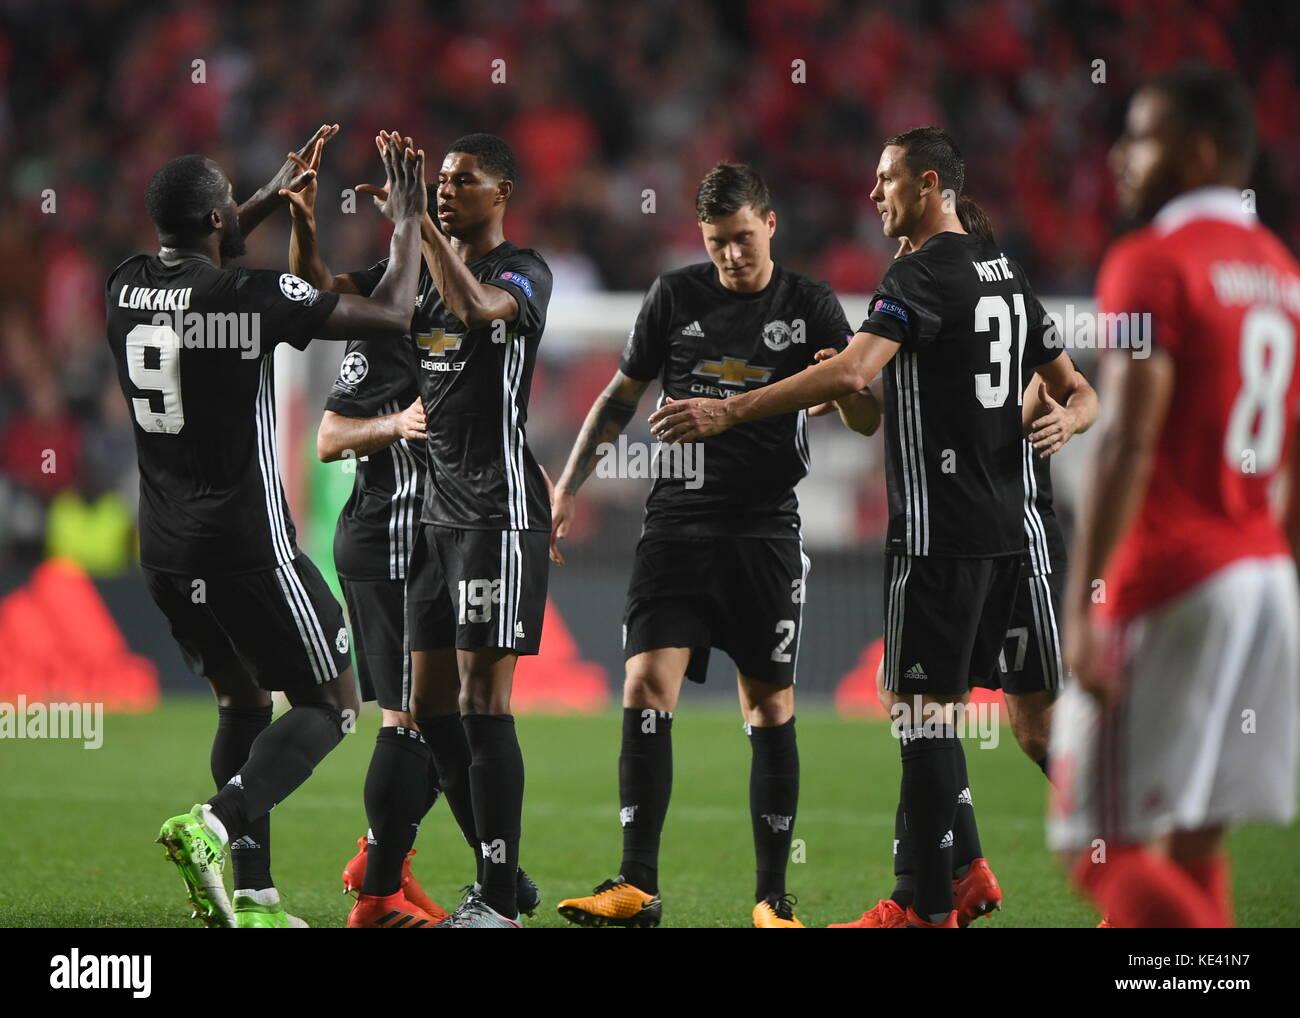 Lisbon. 18th Oct, 2017. Marcus Rashford (2nd L) of Manchester United Stock  Photo - Alamy